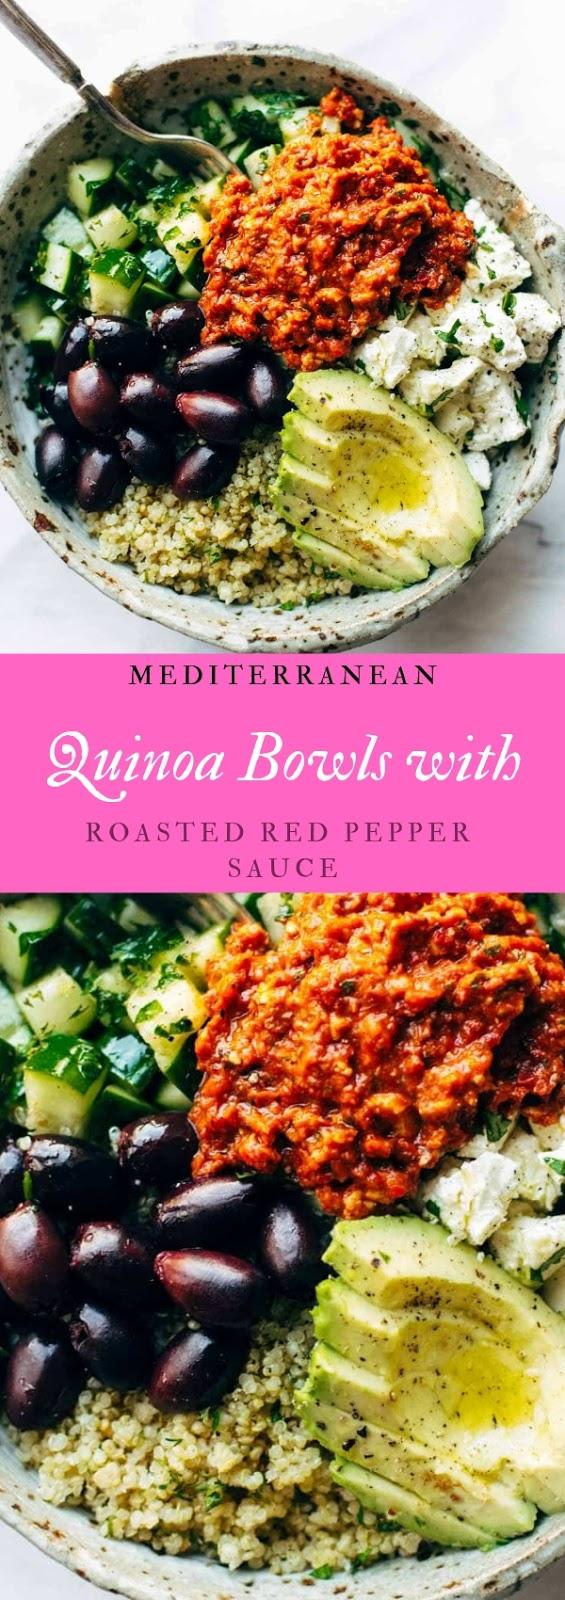 Mediterranean Quinoa Bowls with Roasted Red Pepper Sauce #dinner #diet #food #meditteranean #quinoa 3bowl #roasted #redpepper #sauce